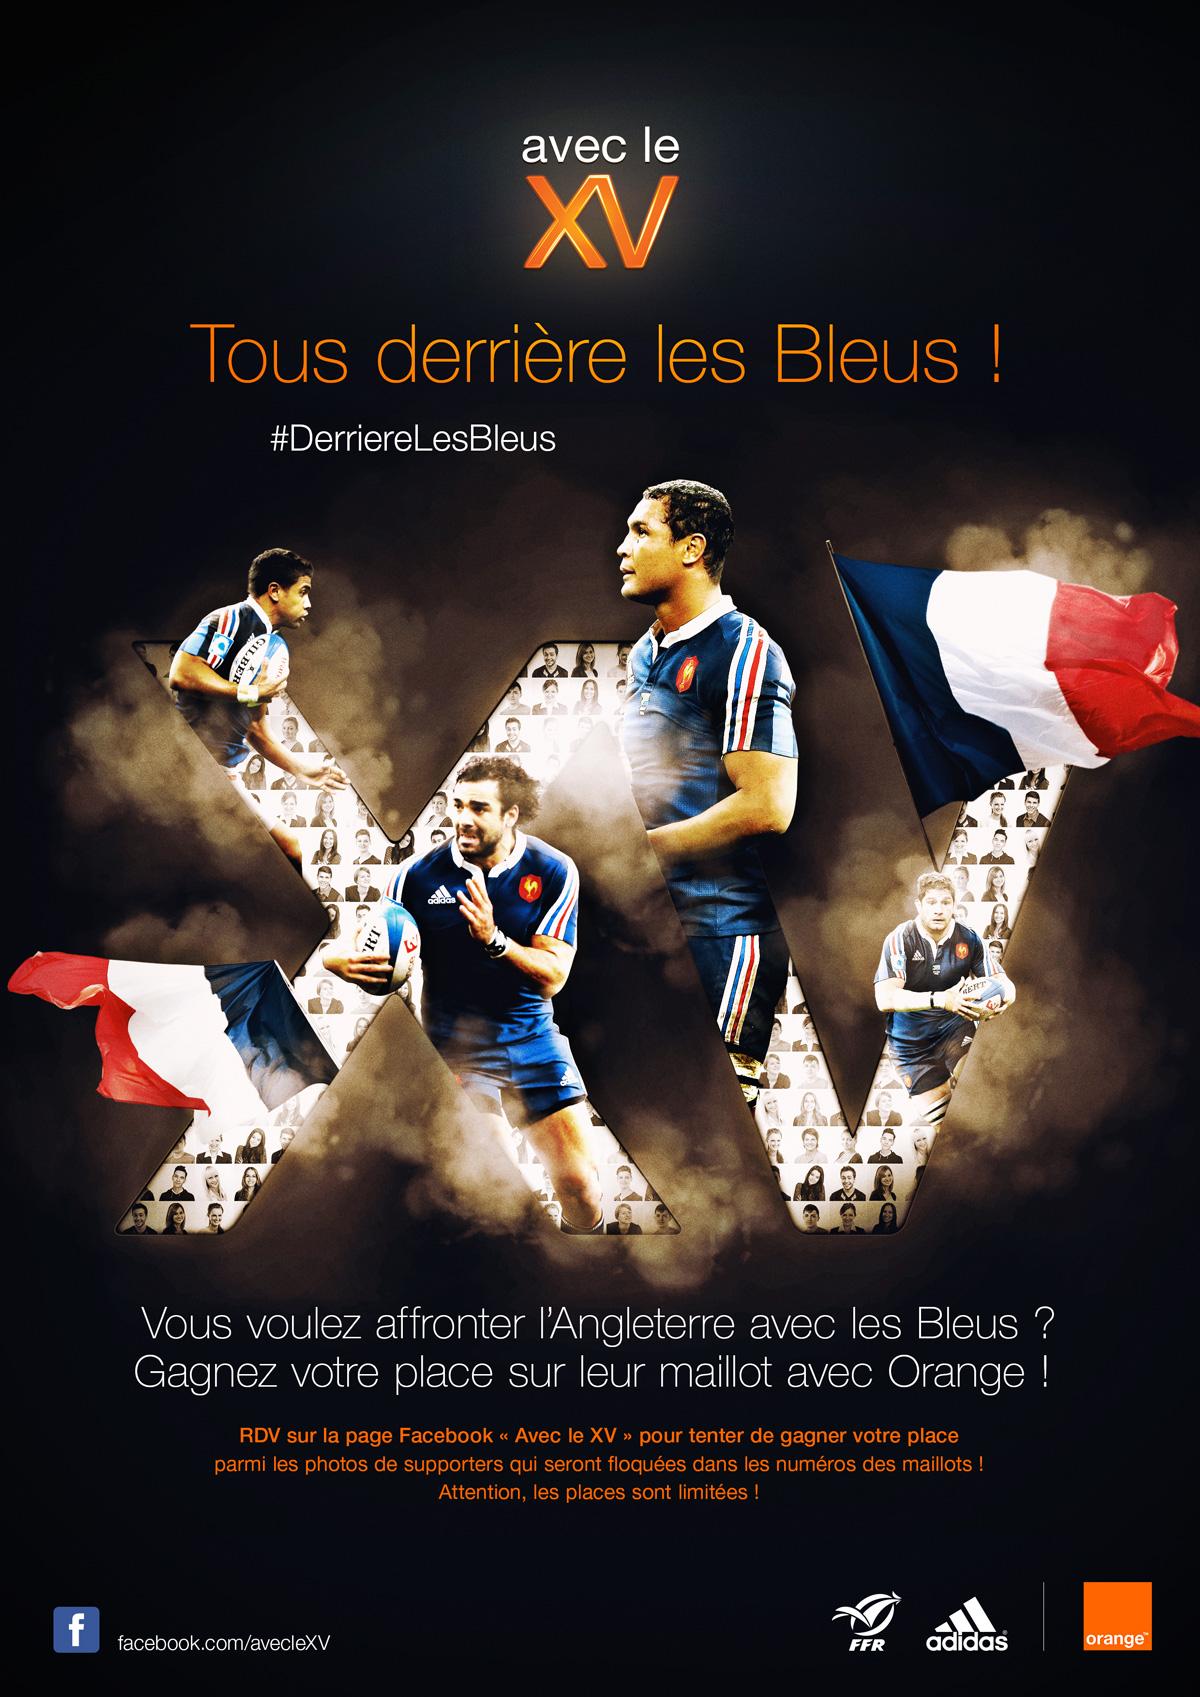 orange Xv de france photo maillot rugby france supporter